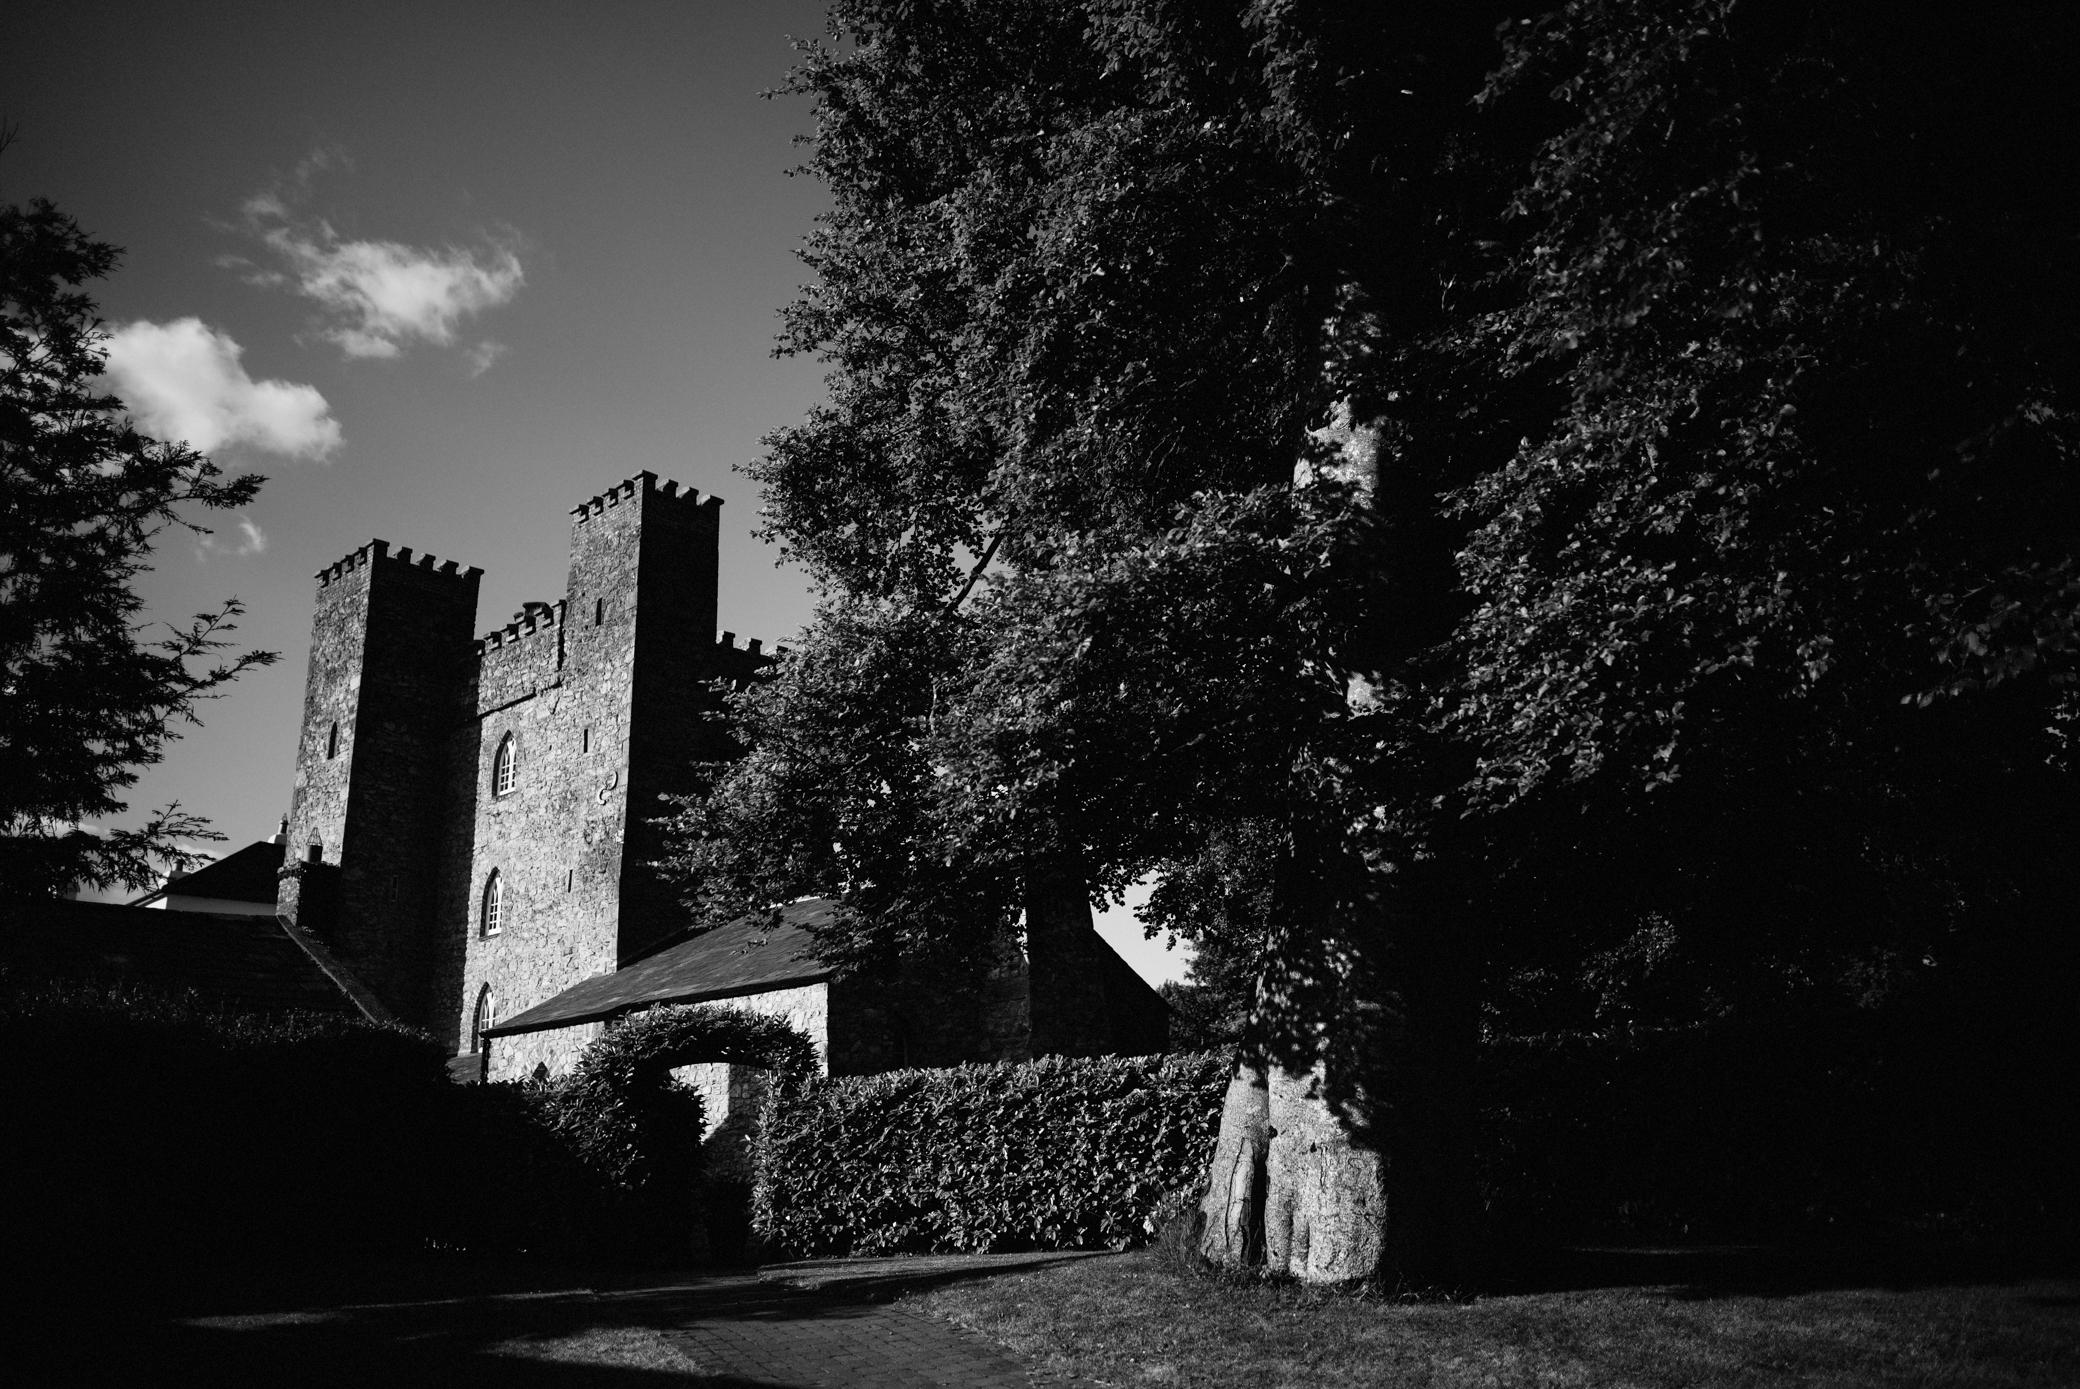 Alan&Naz- Barberstown Castle Wedding - Wedding photographer Ireland-185.jpg